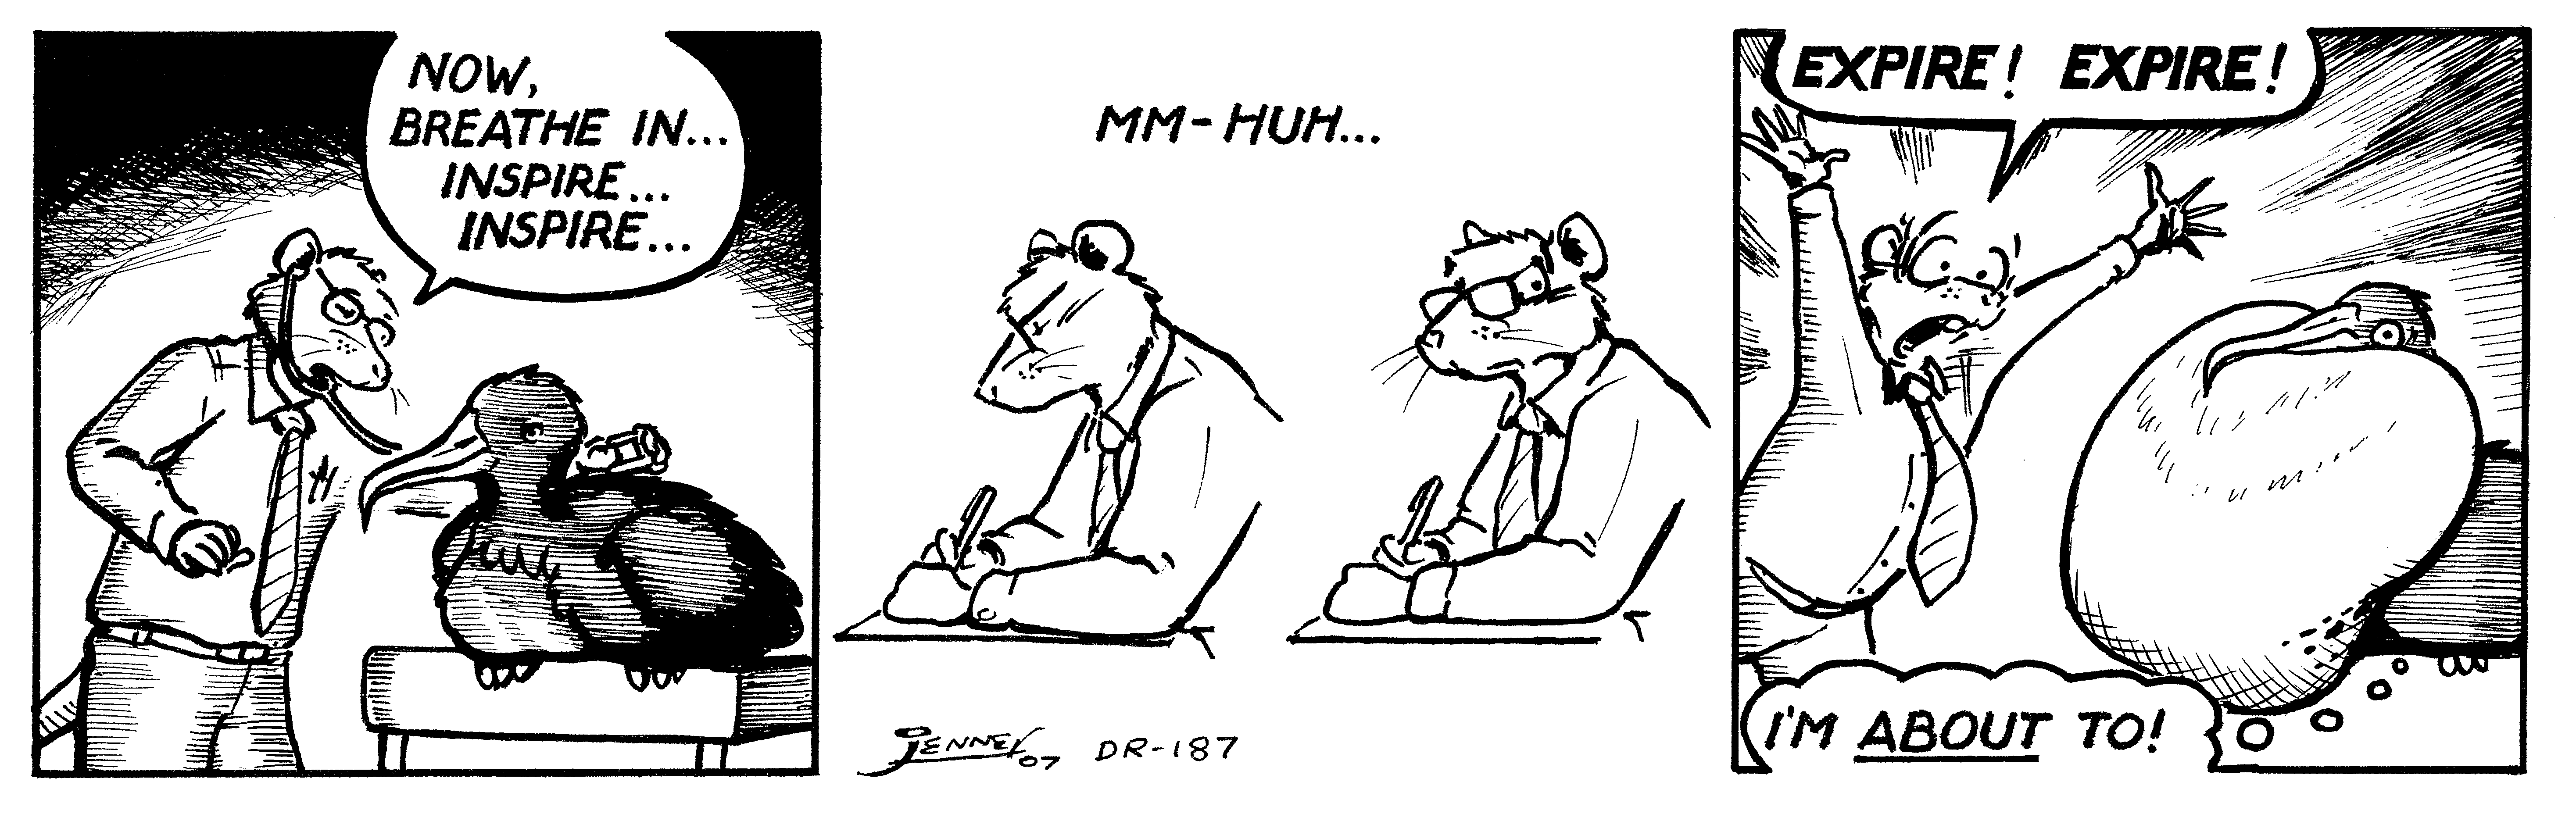 20070314